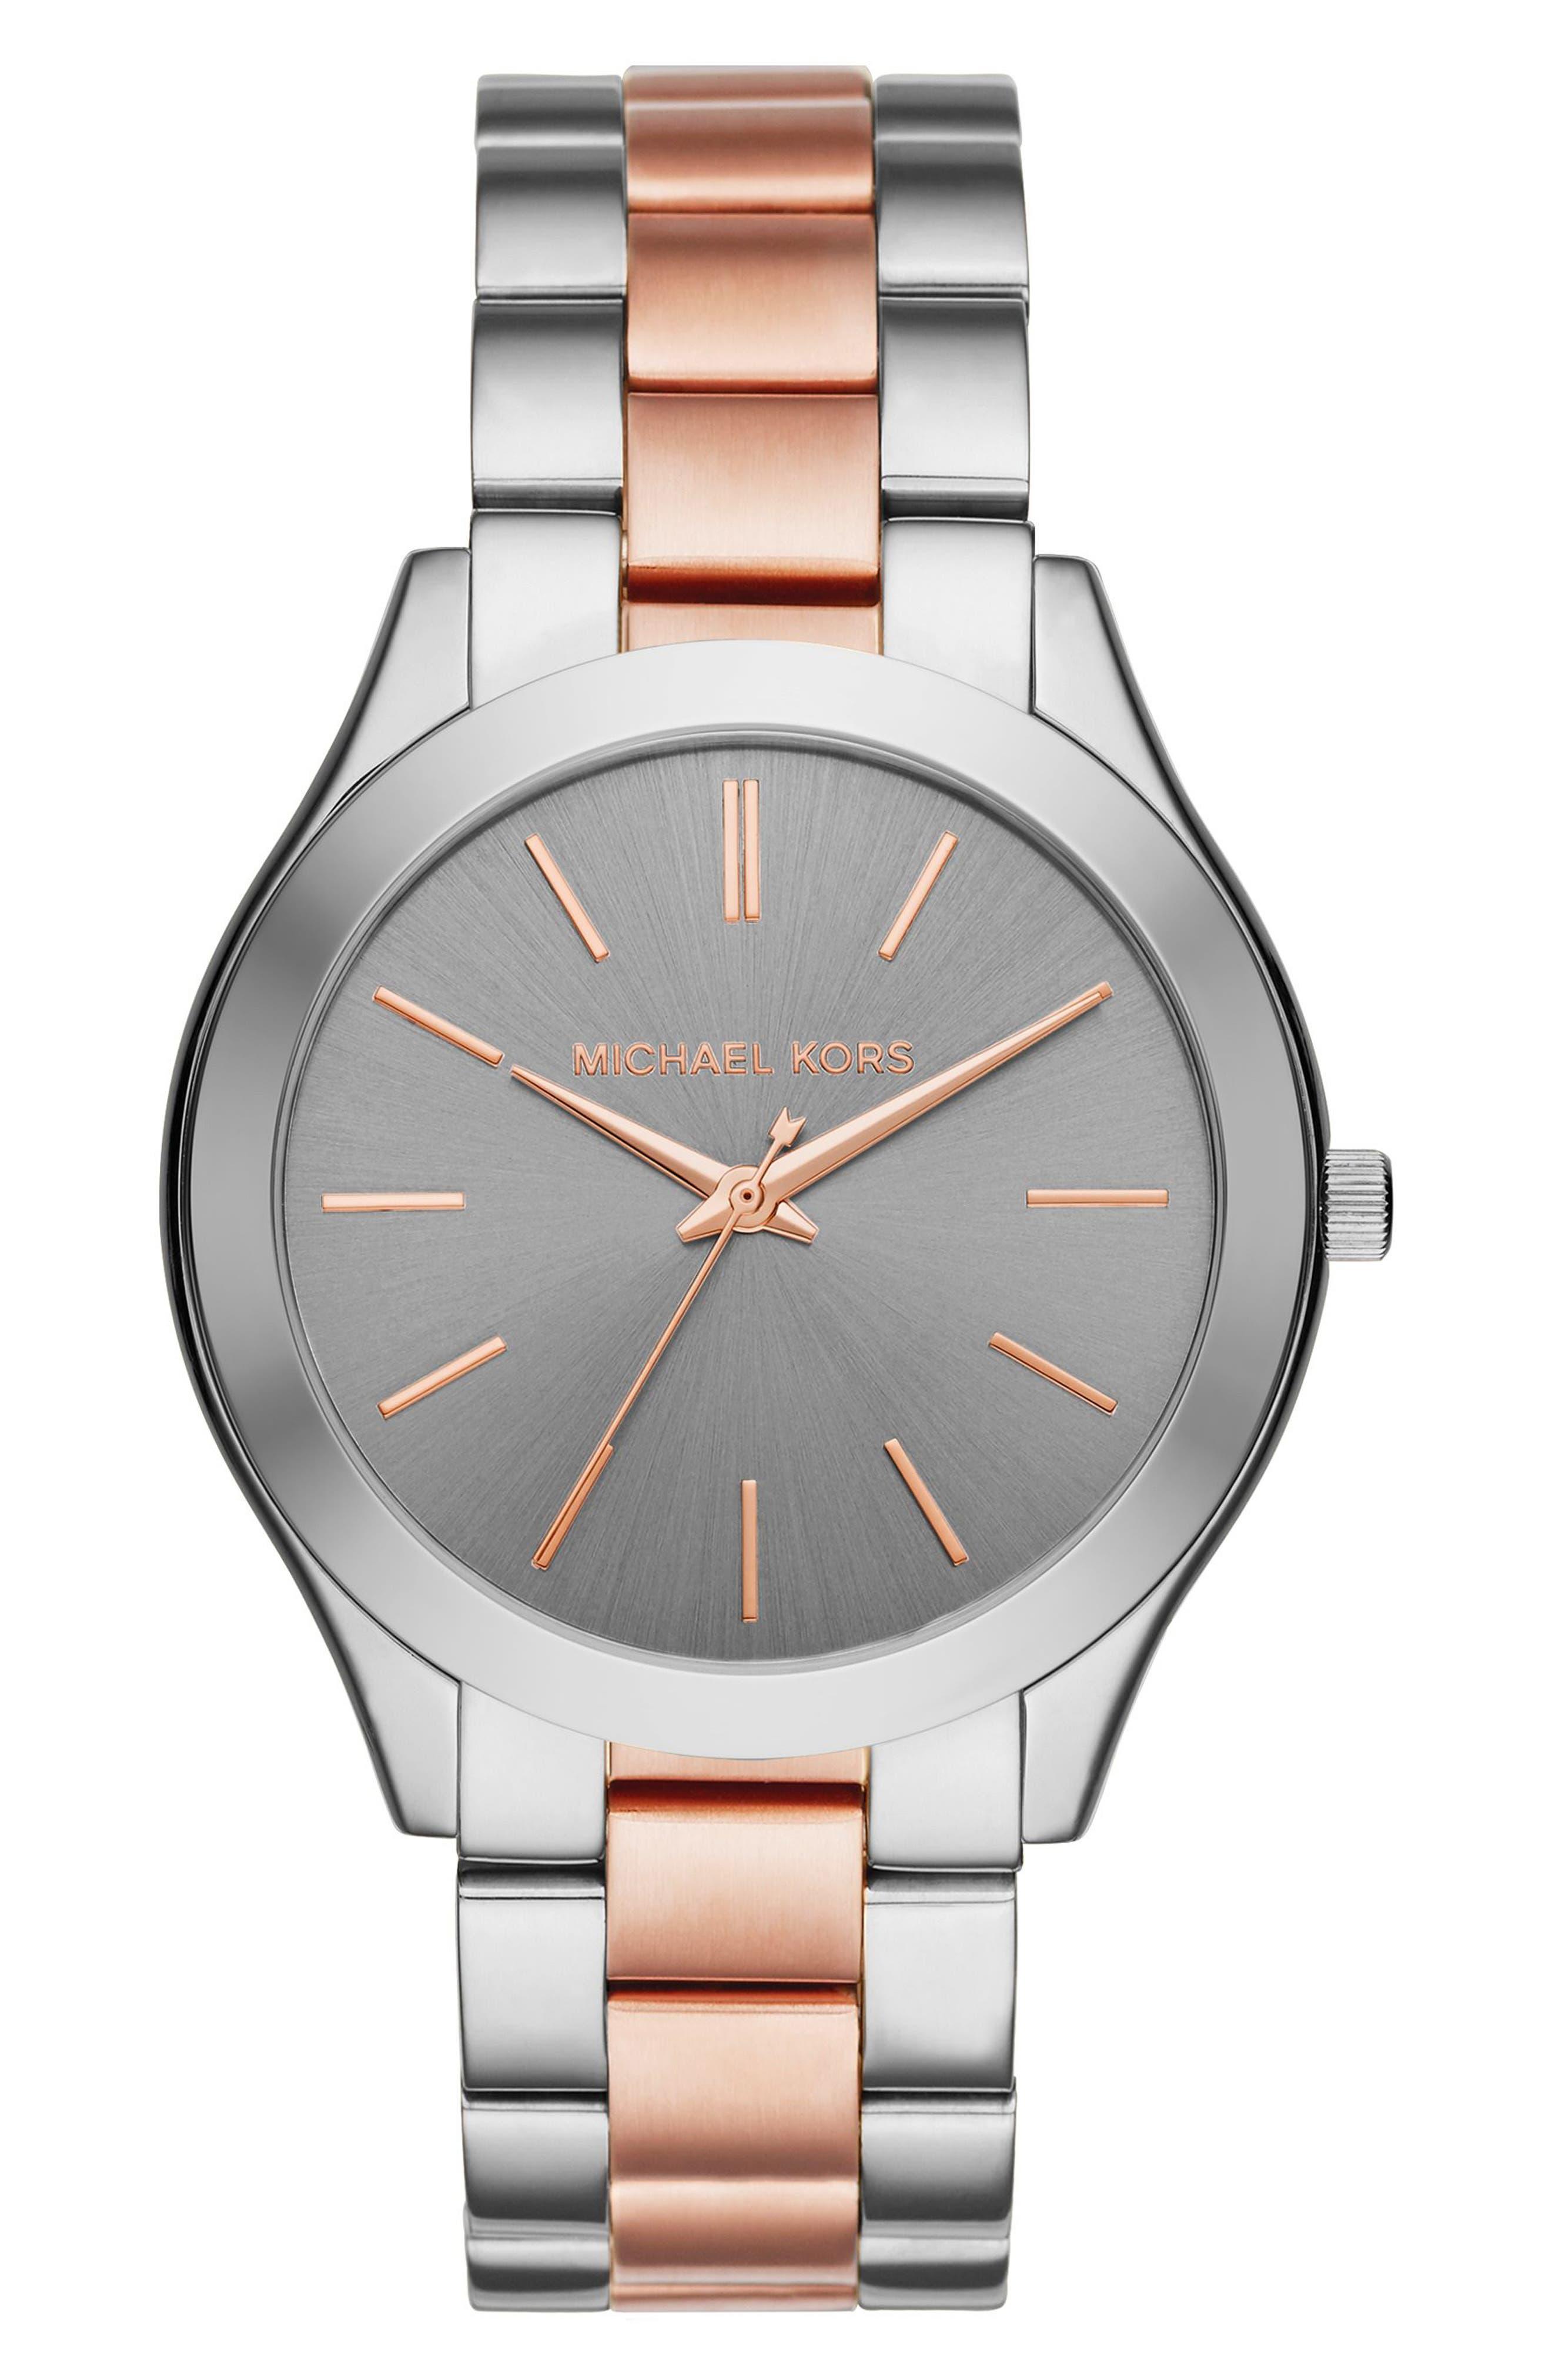 MICHAEL KORS, 'Slim Runway' Bracelet Watch, 42mm, Main thumbnail 1, color, 049